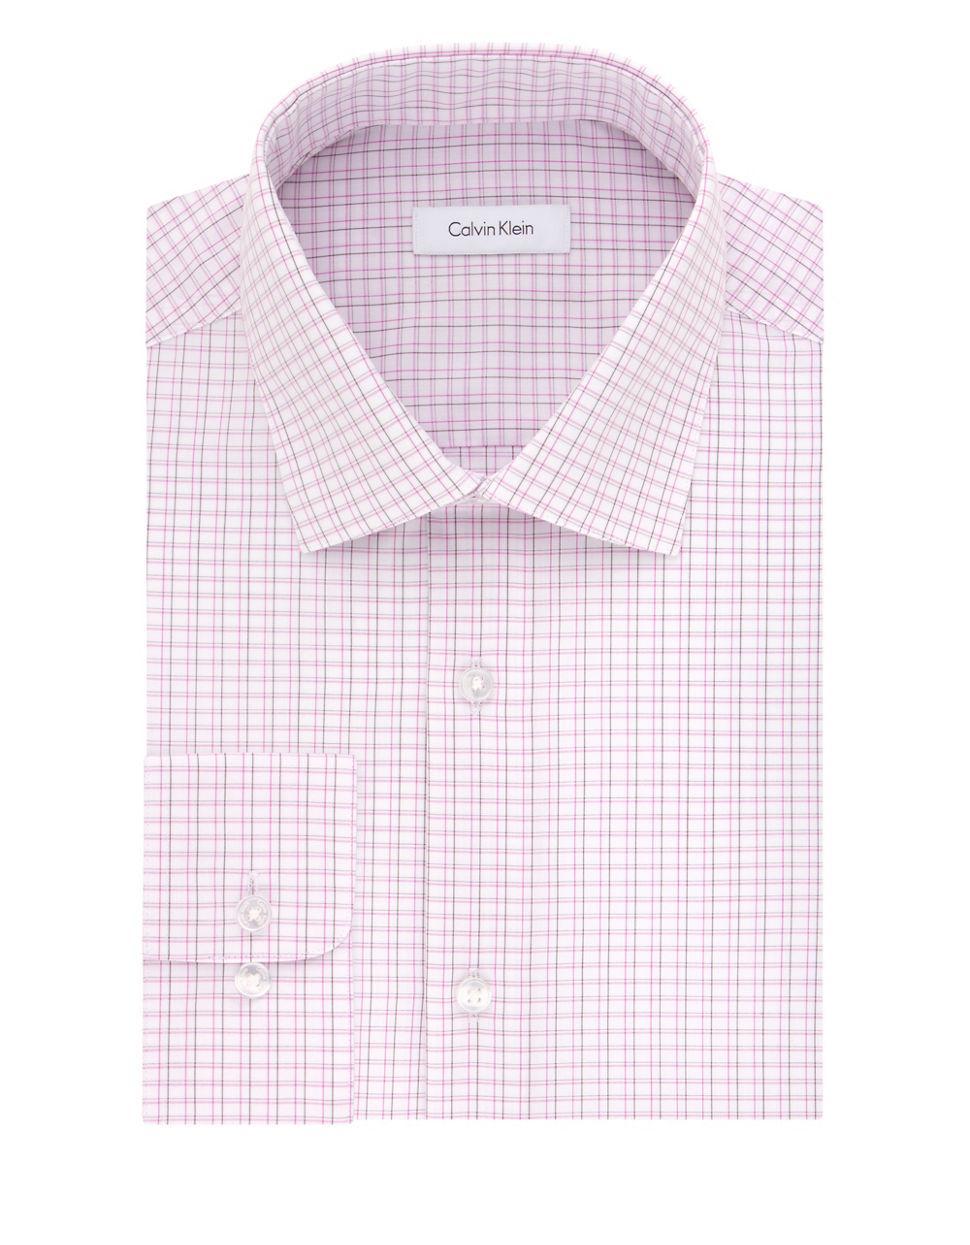 Calvin klein regular fit check dress shirt in pink for men for Pink checkered dress shirt